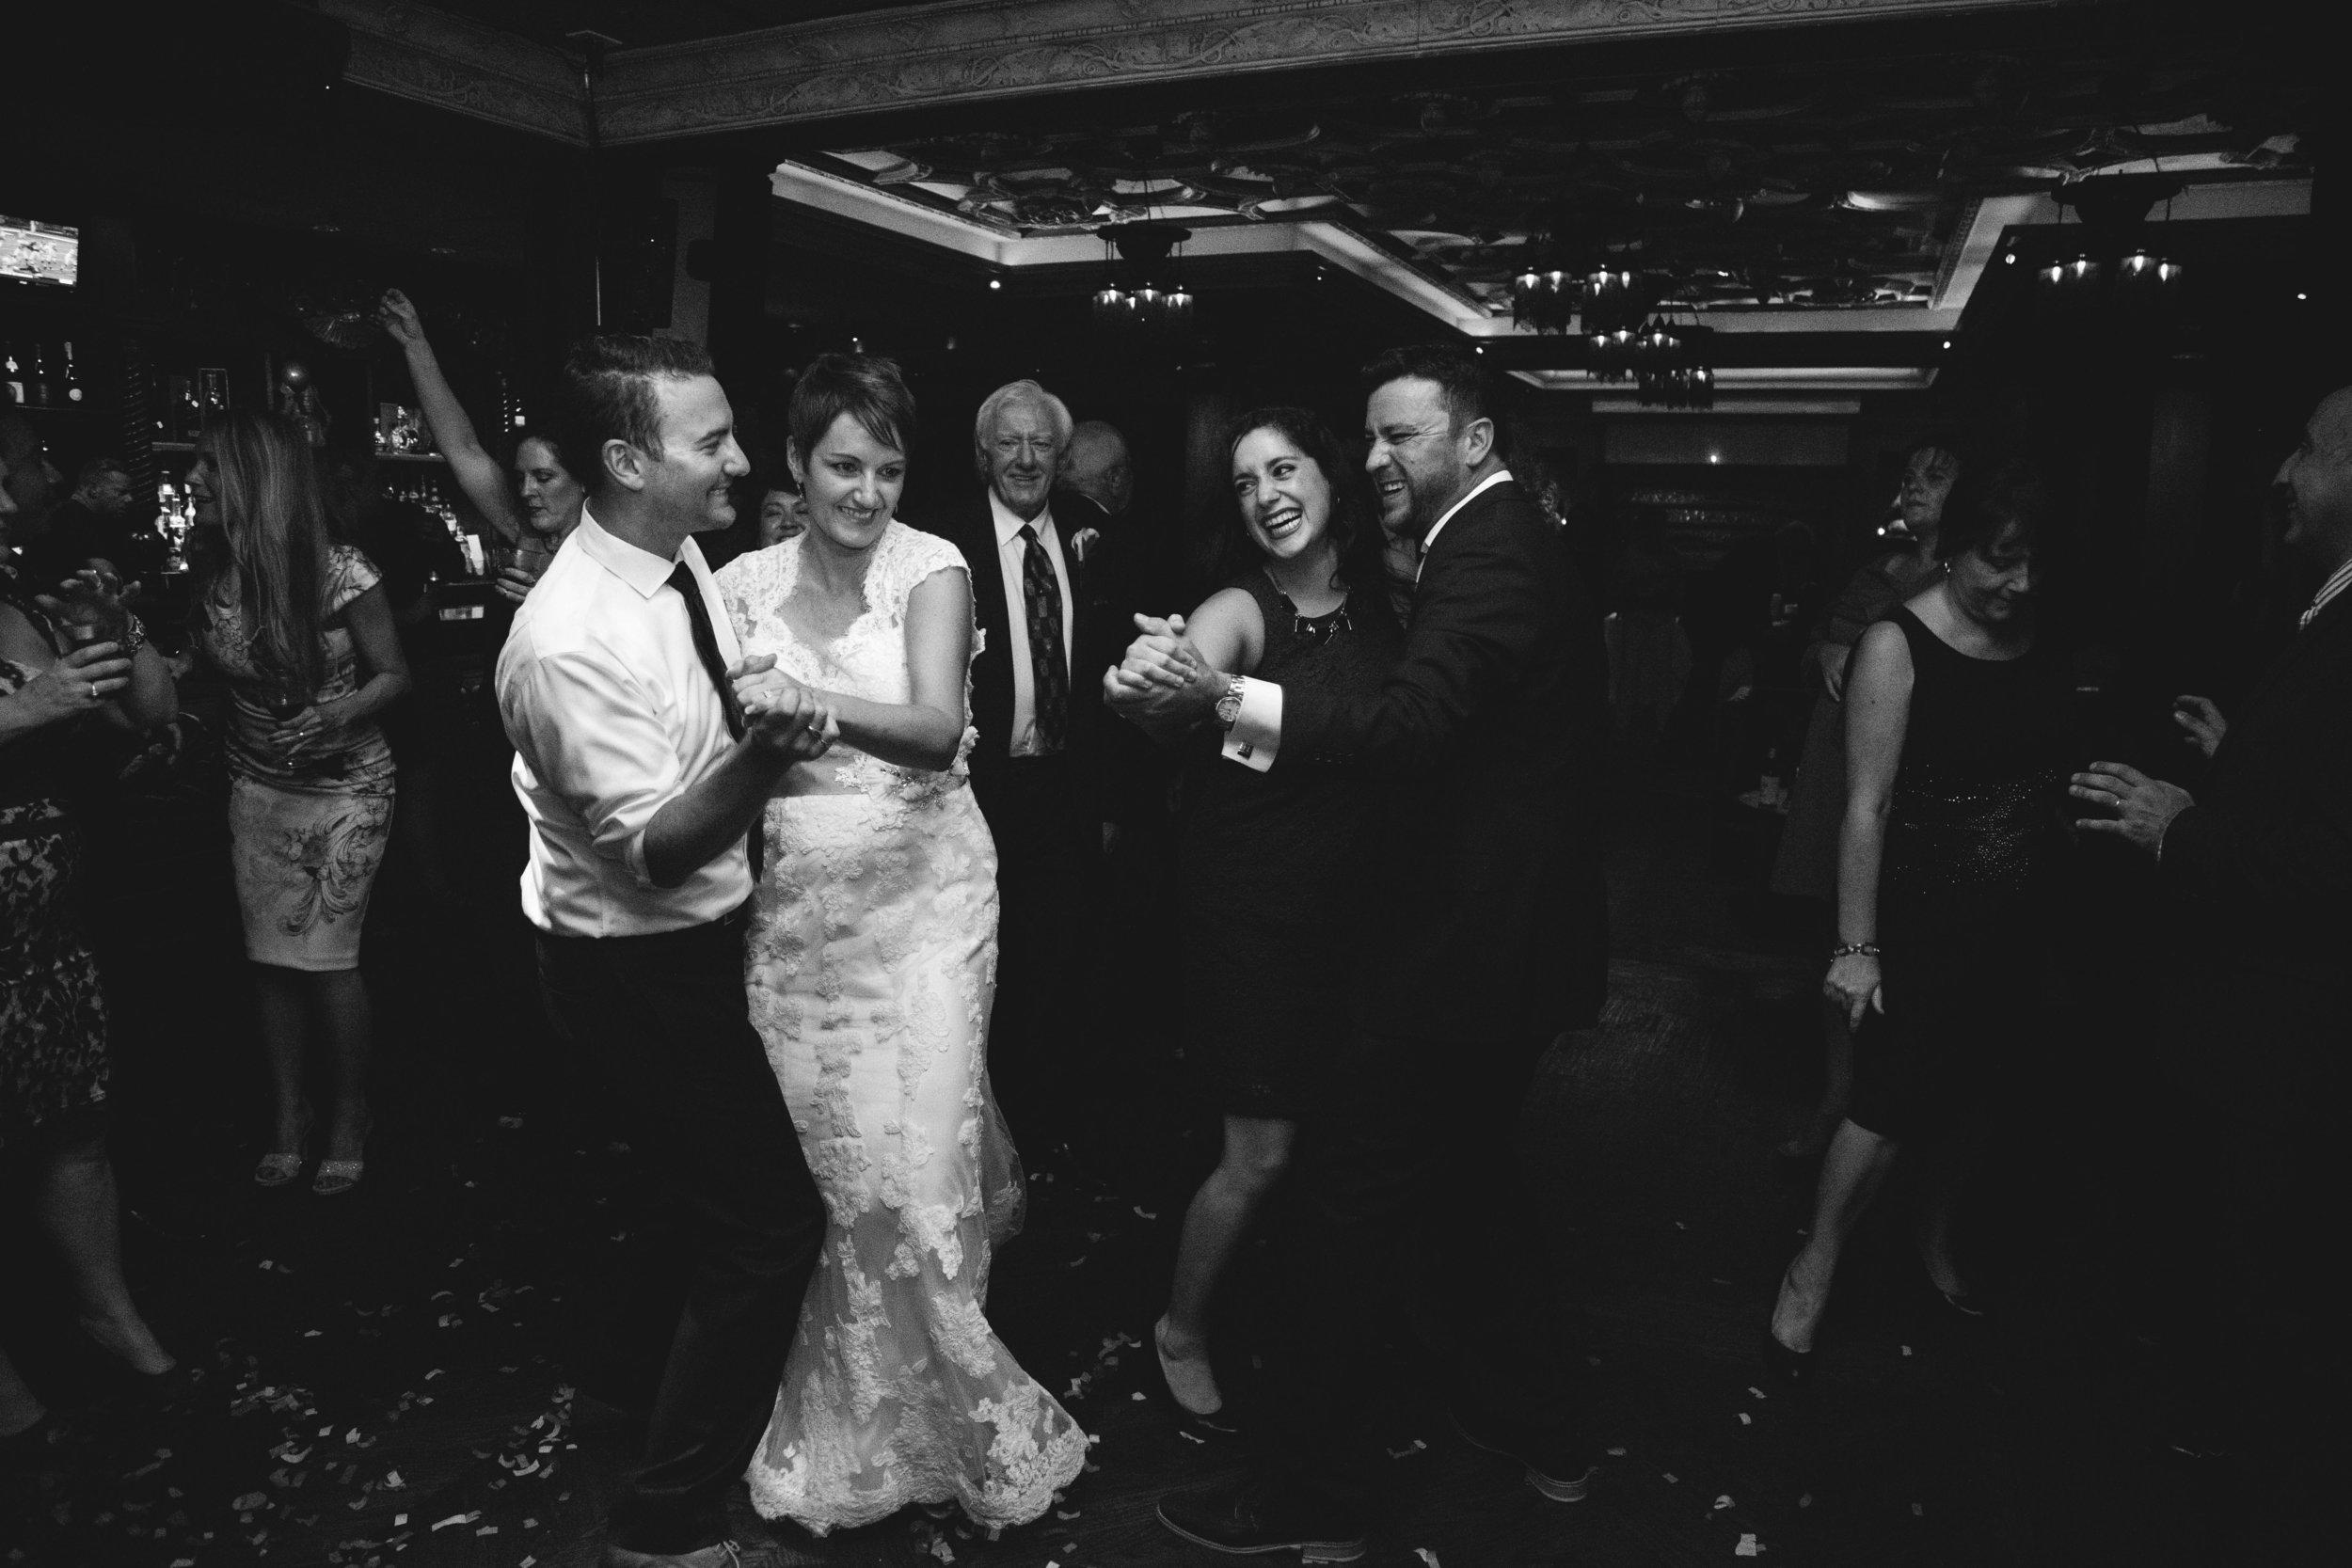 ATGI_Kat and Gabe Wedding 2016_2S8A6303.jpg